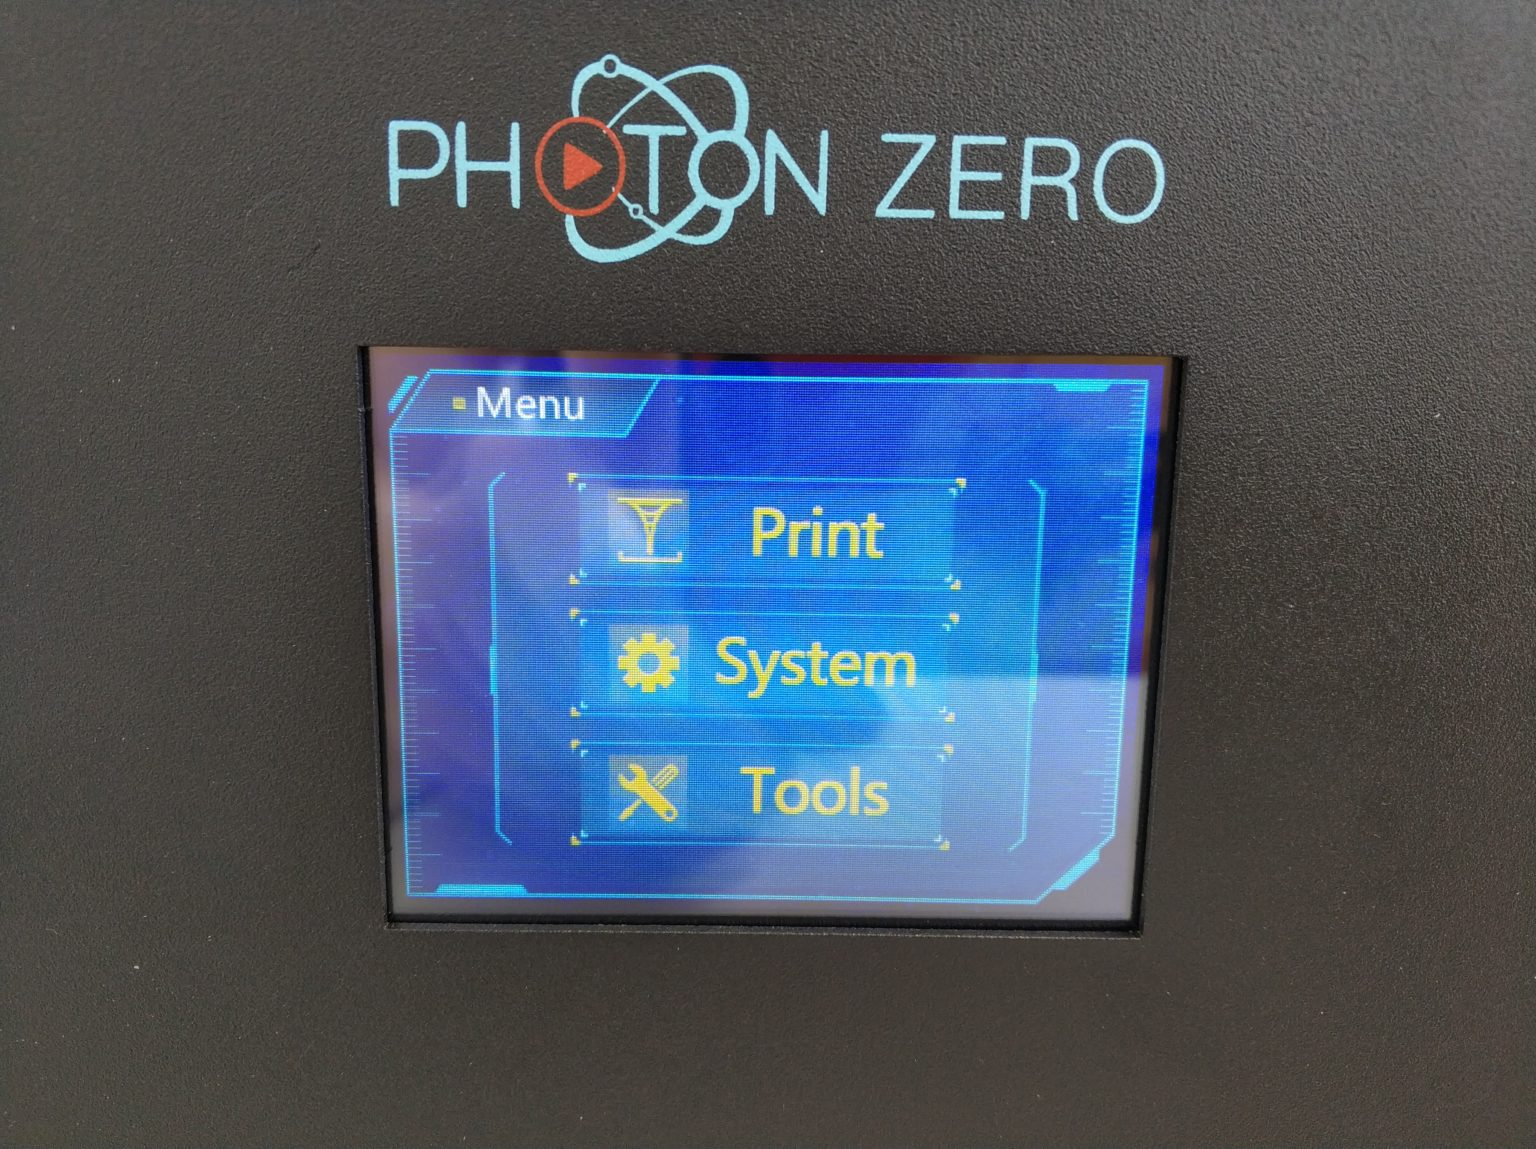 Pantalla de la Anycubic Photon Zero